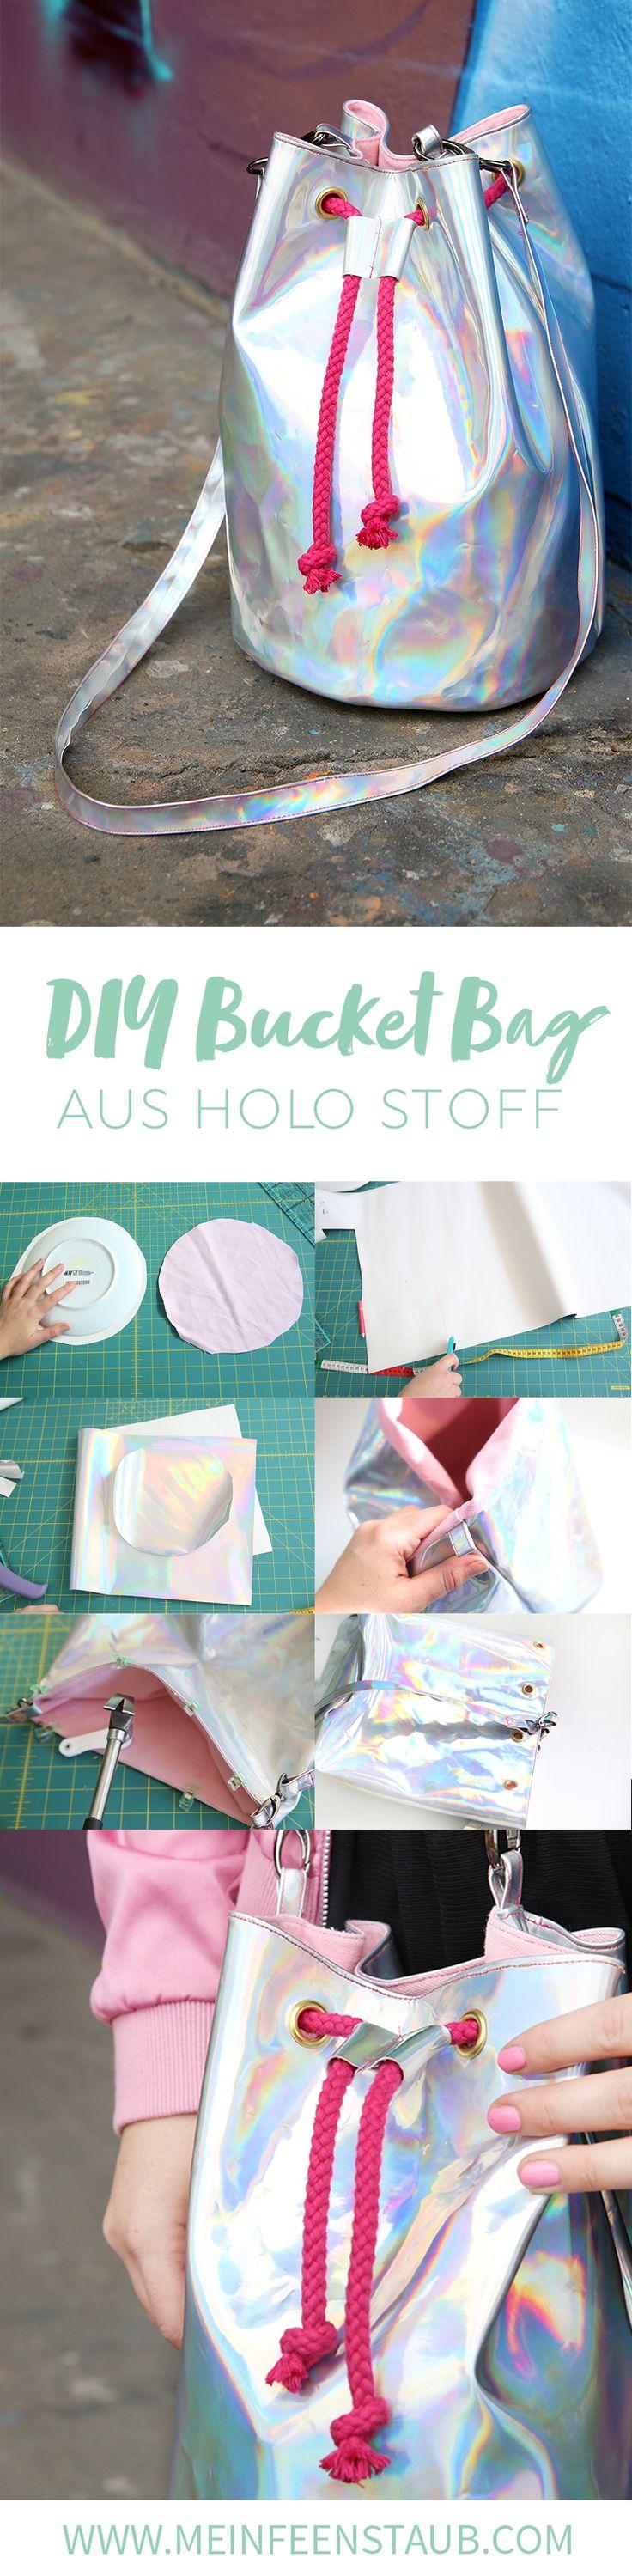 DIY Tutorial Bucket Bag nähen ohne Schnittmuster schicke Bucket Bag mit Futter selbernähen